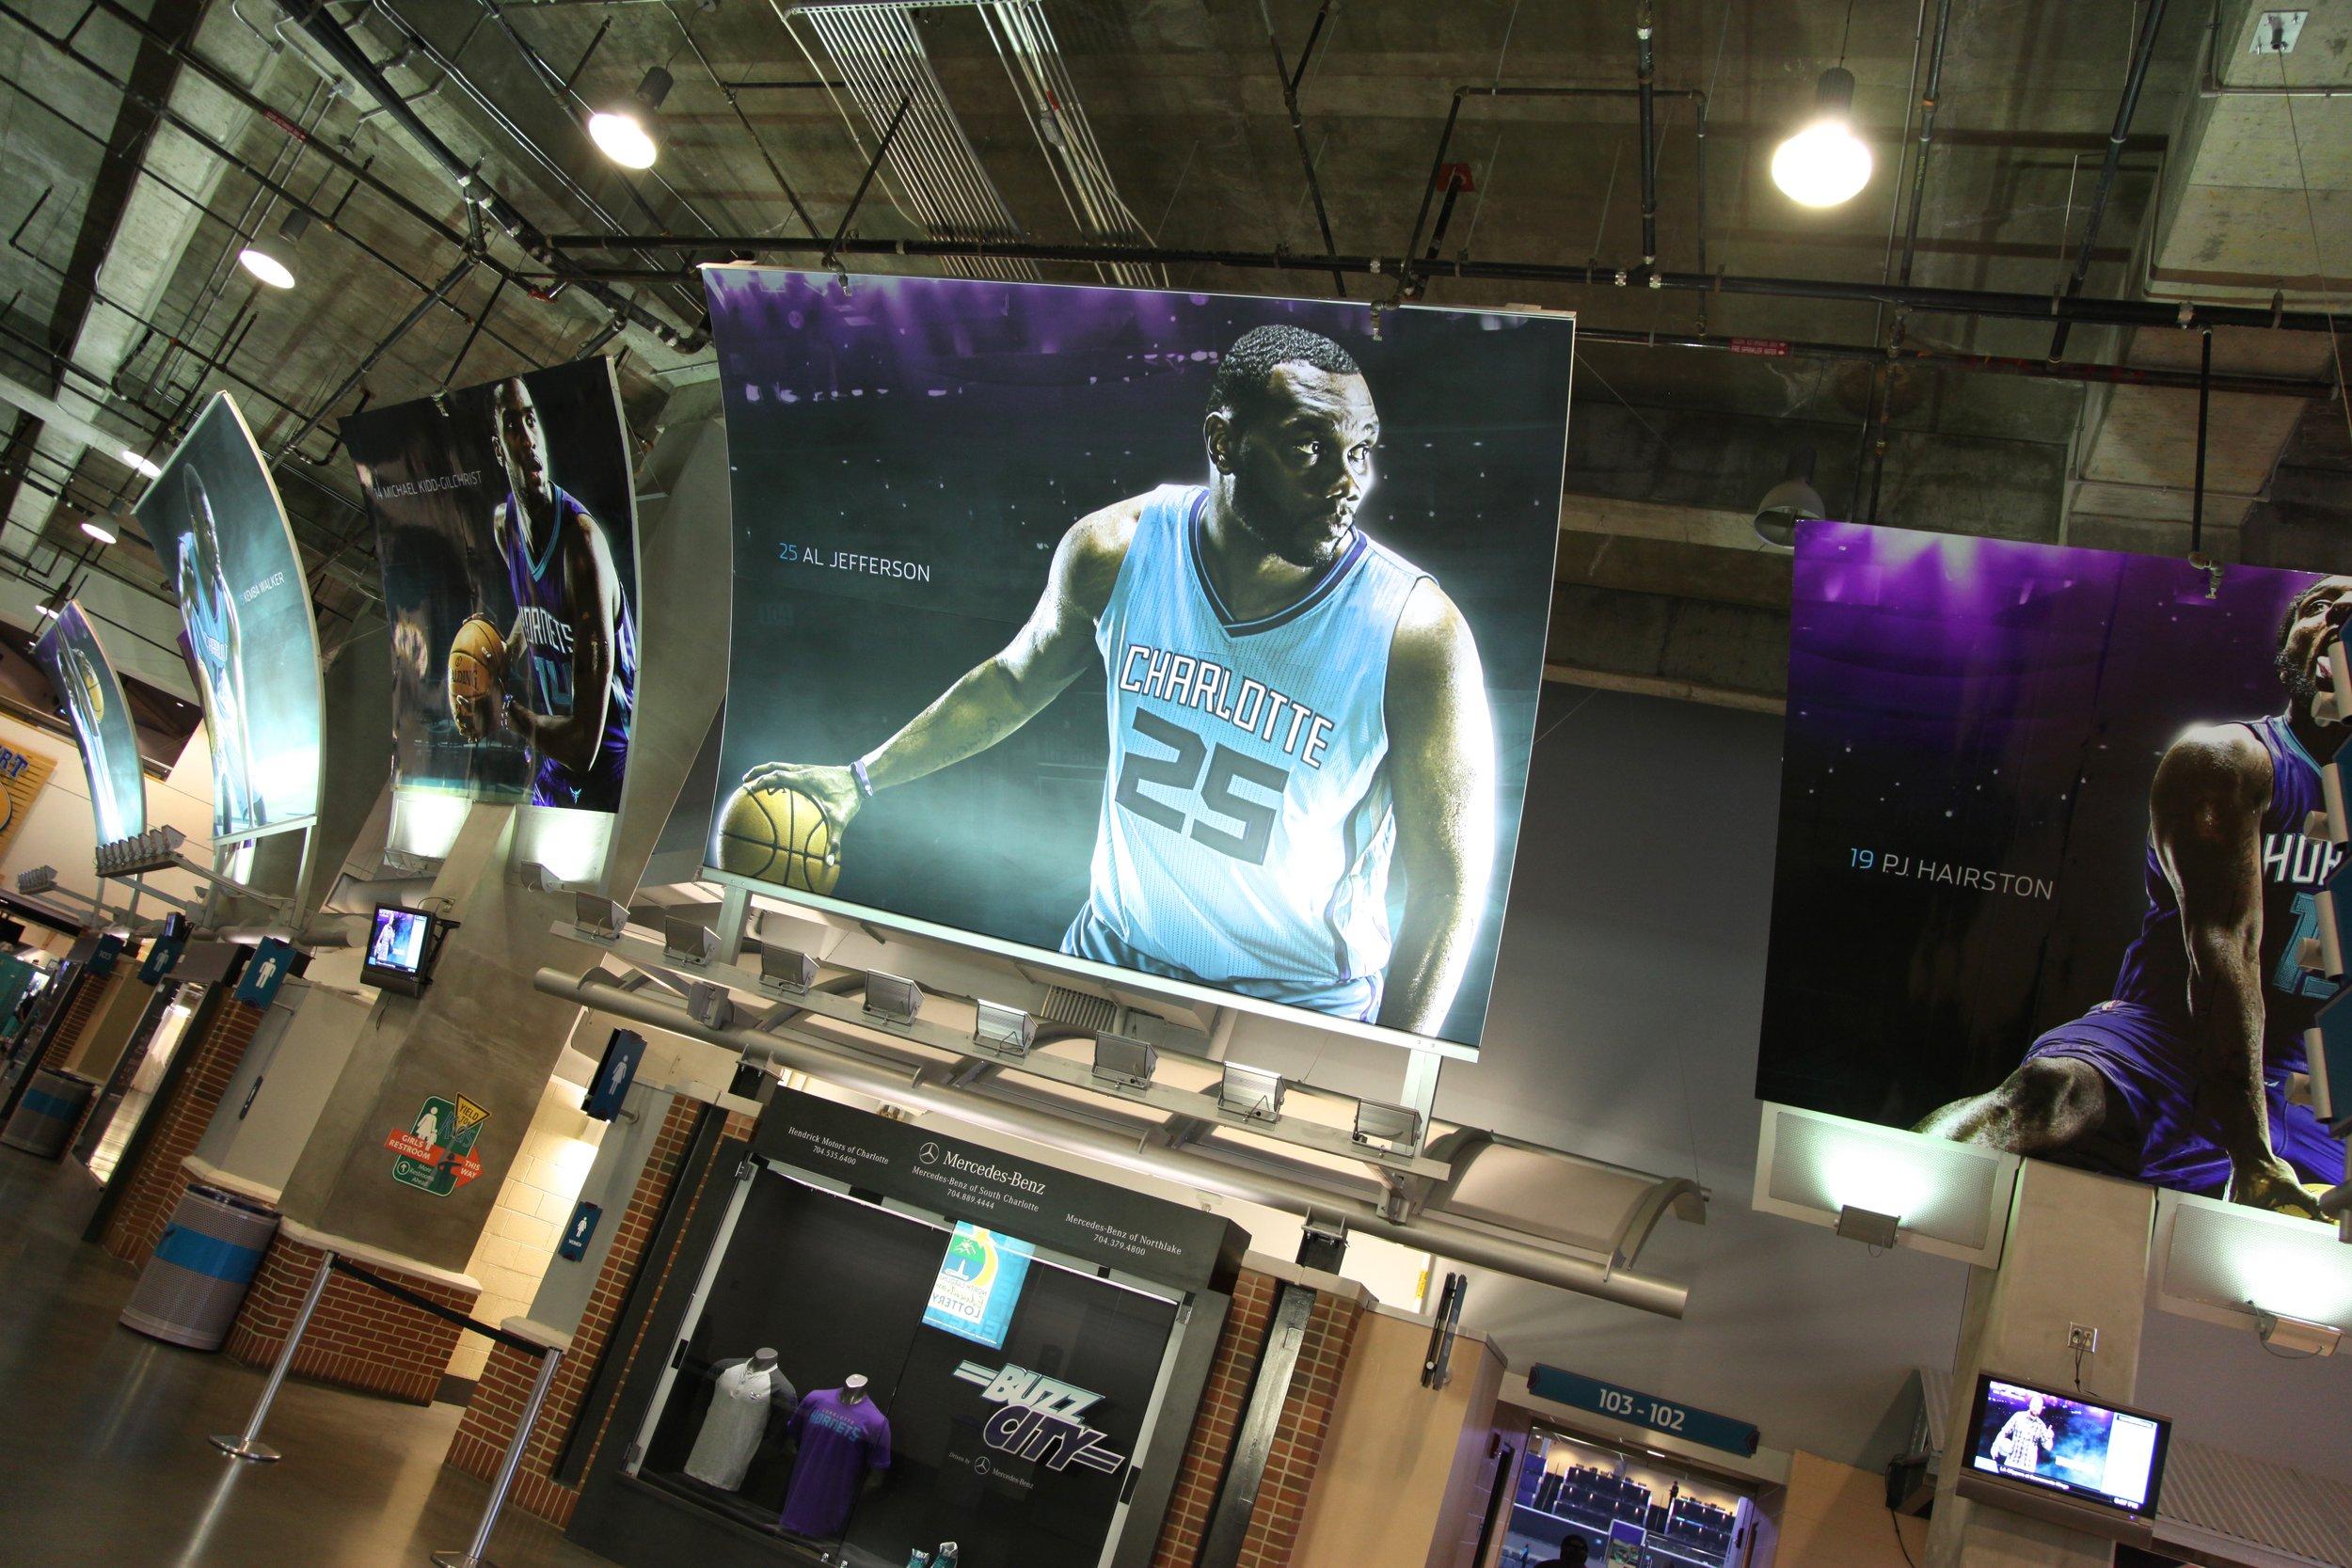 Hornets Curved Player Ceiling Mount_Al_Jefferson.JPG